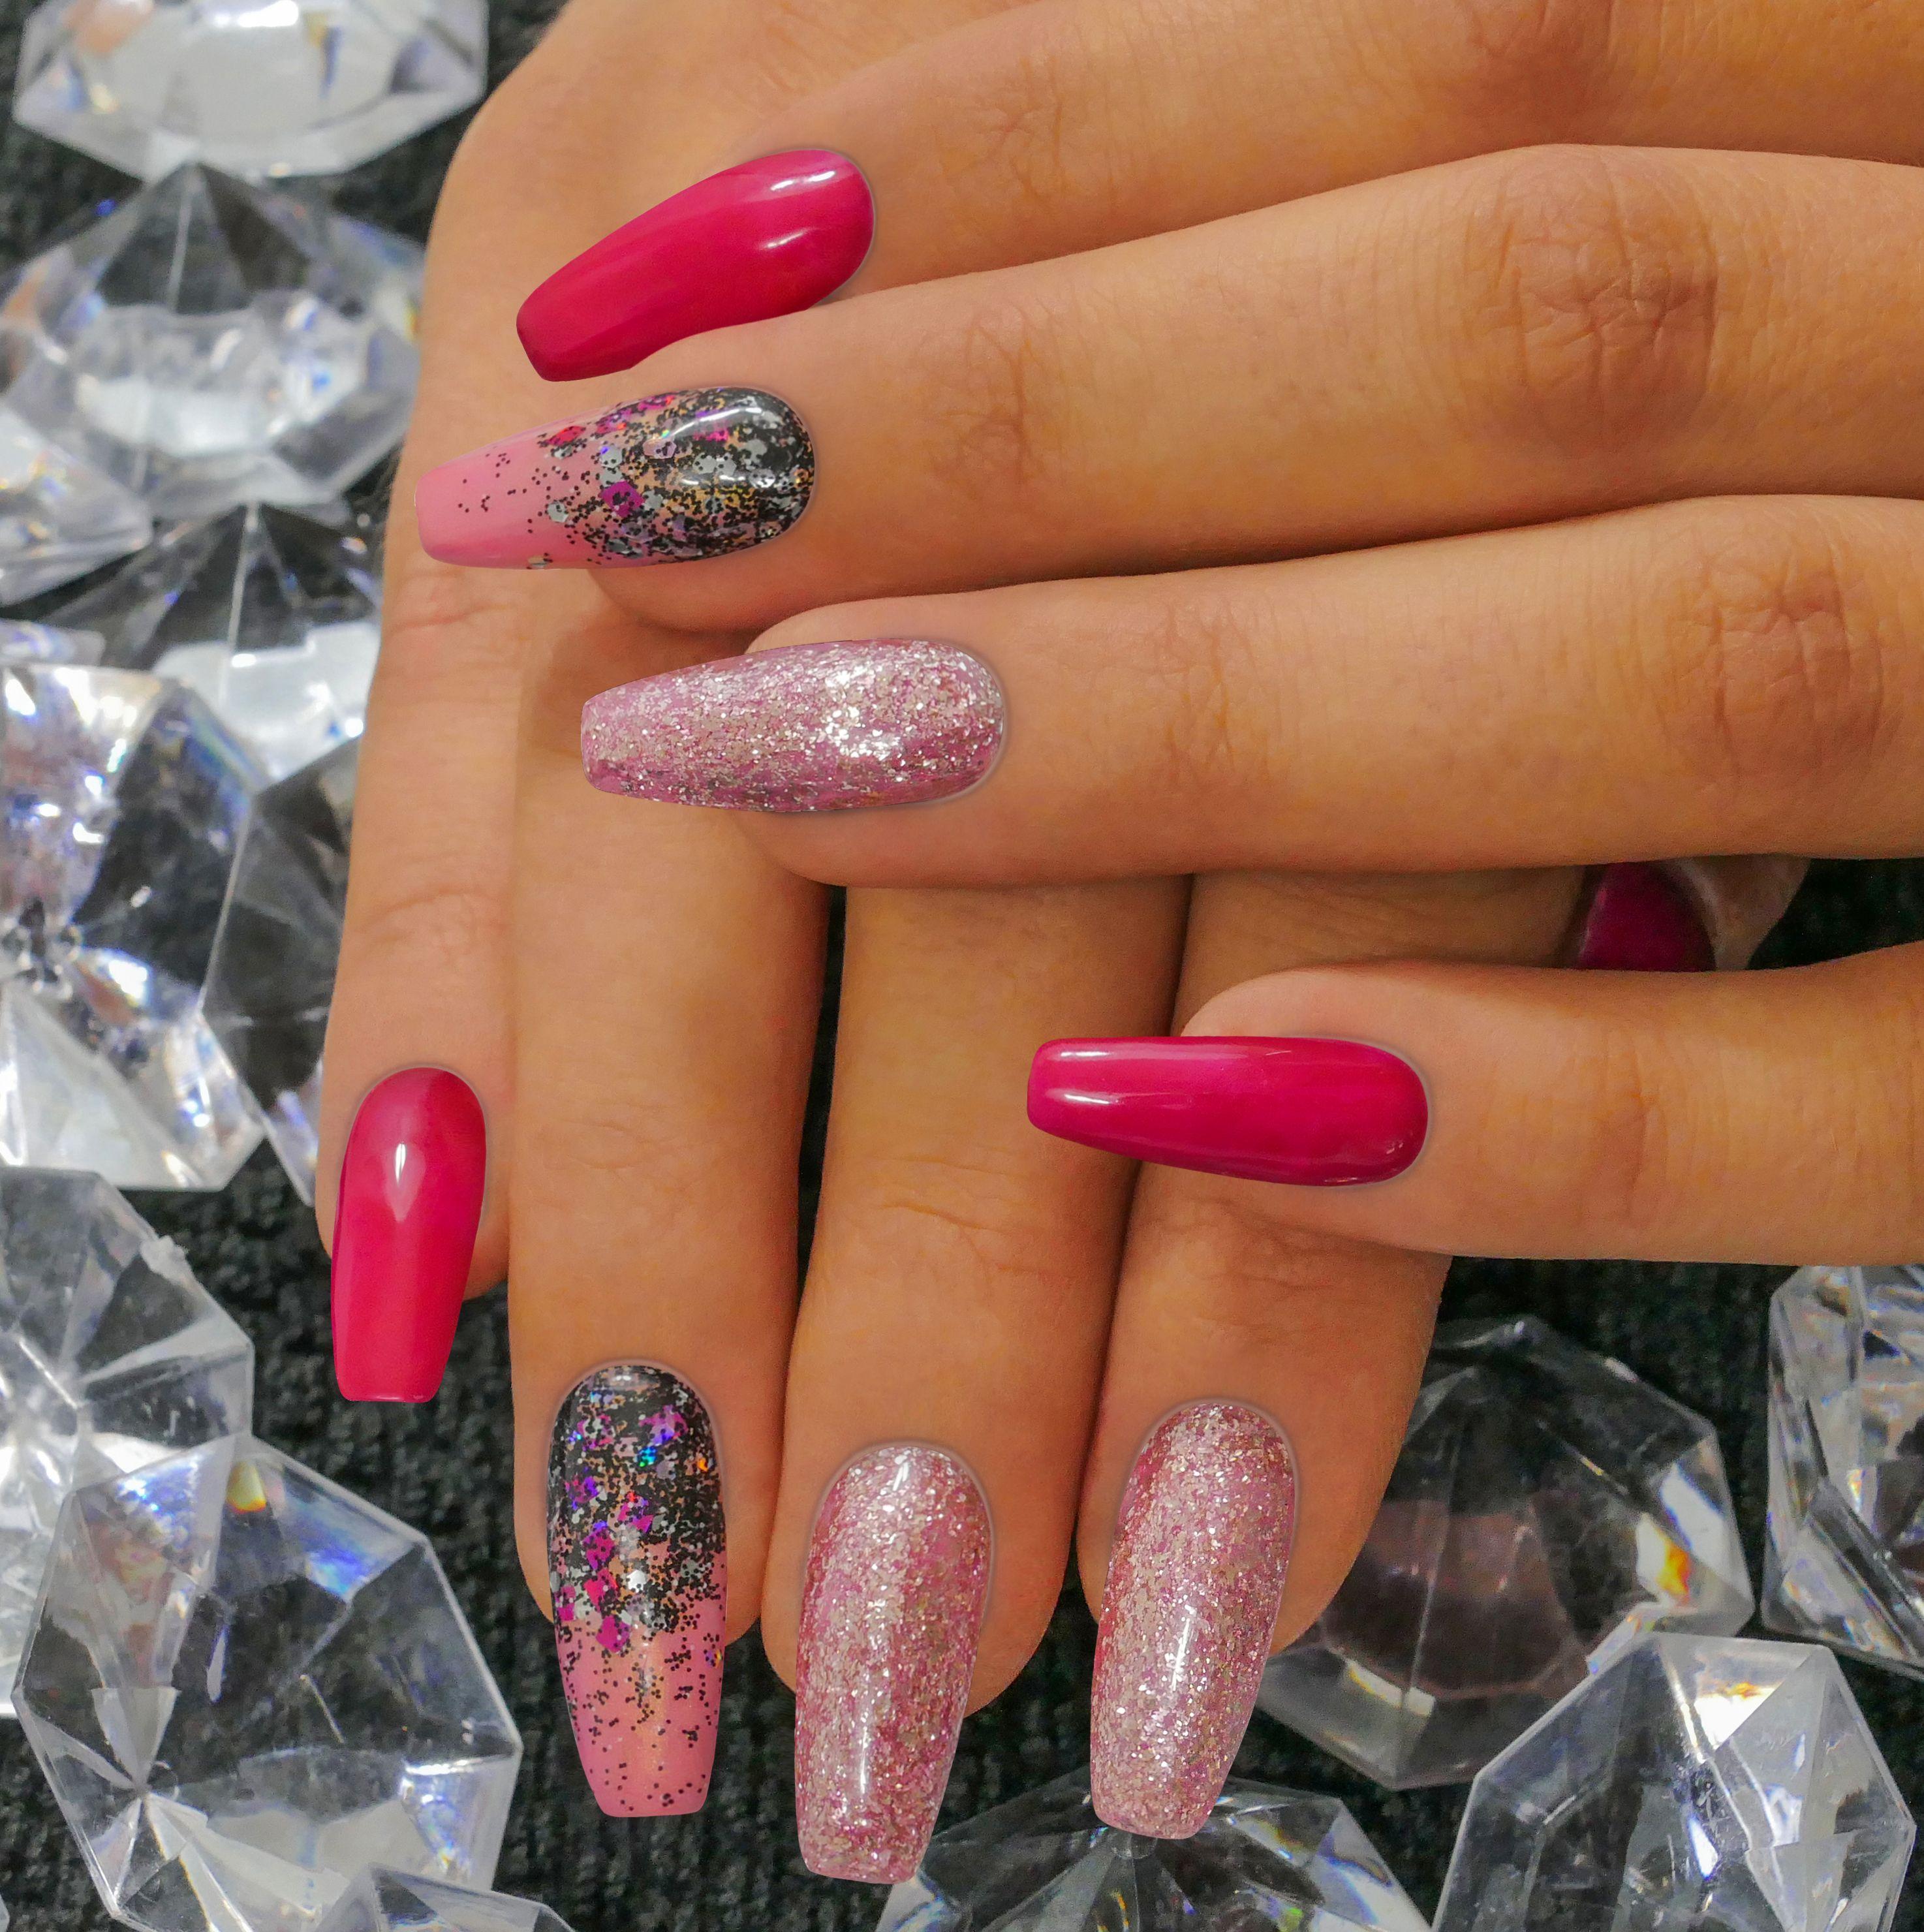 Kombinace Trpytek A Ruzove Ta Nikdy Nezklame Manicure Nails Naninails Nailart Pink Glitter Nail Art Nail Designs Nails